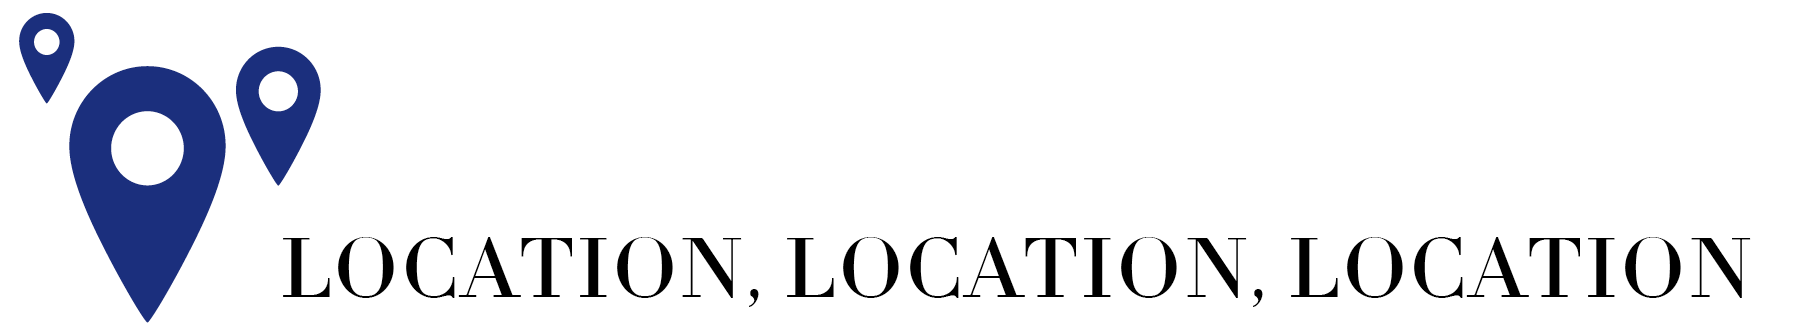 Sapphire Education - location location location